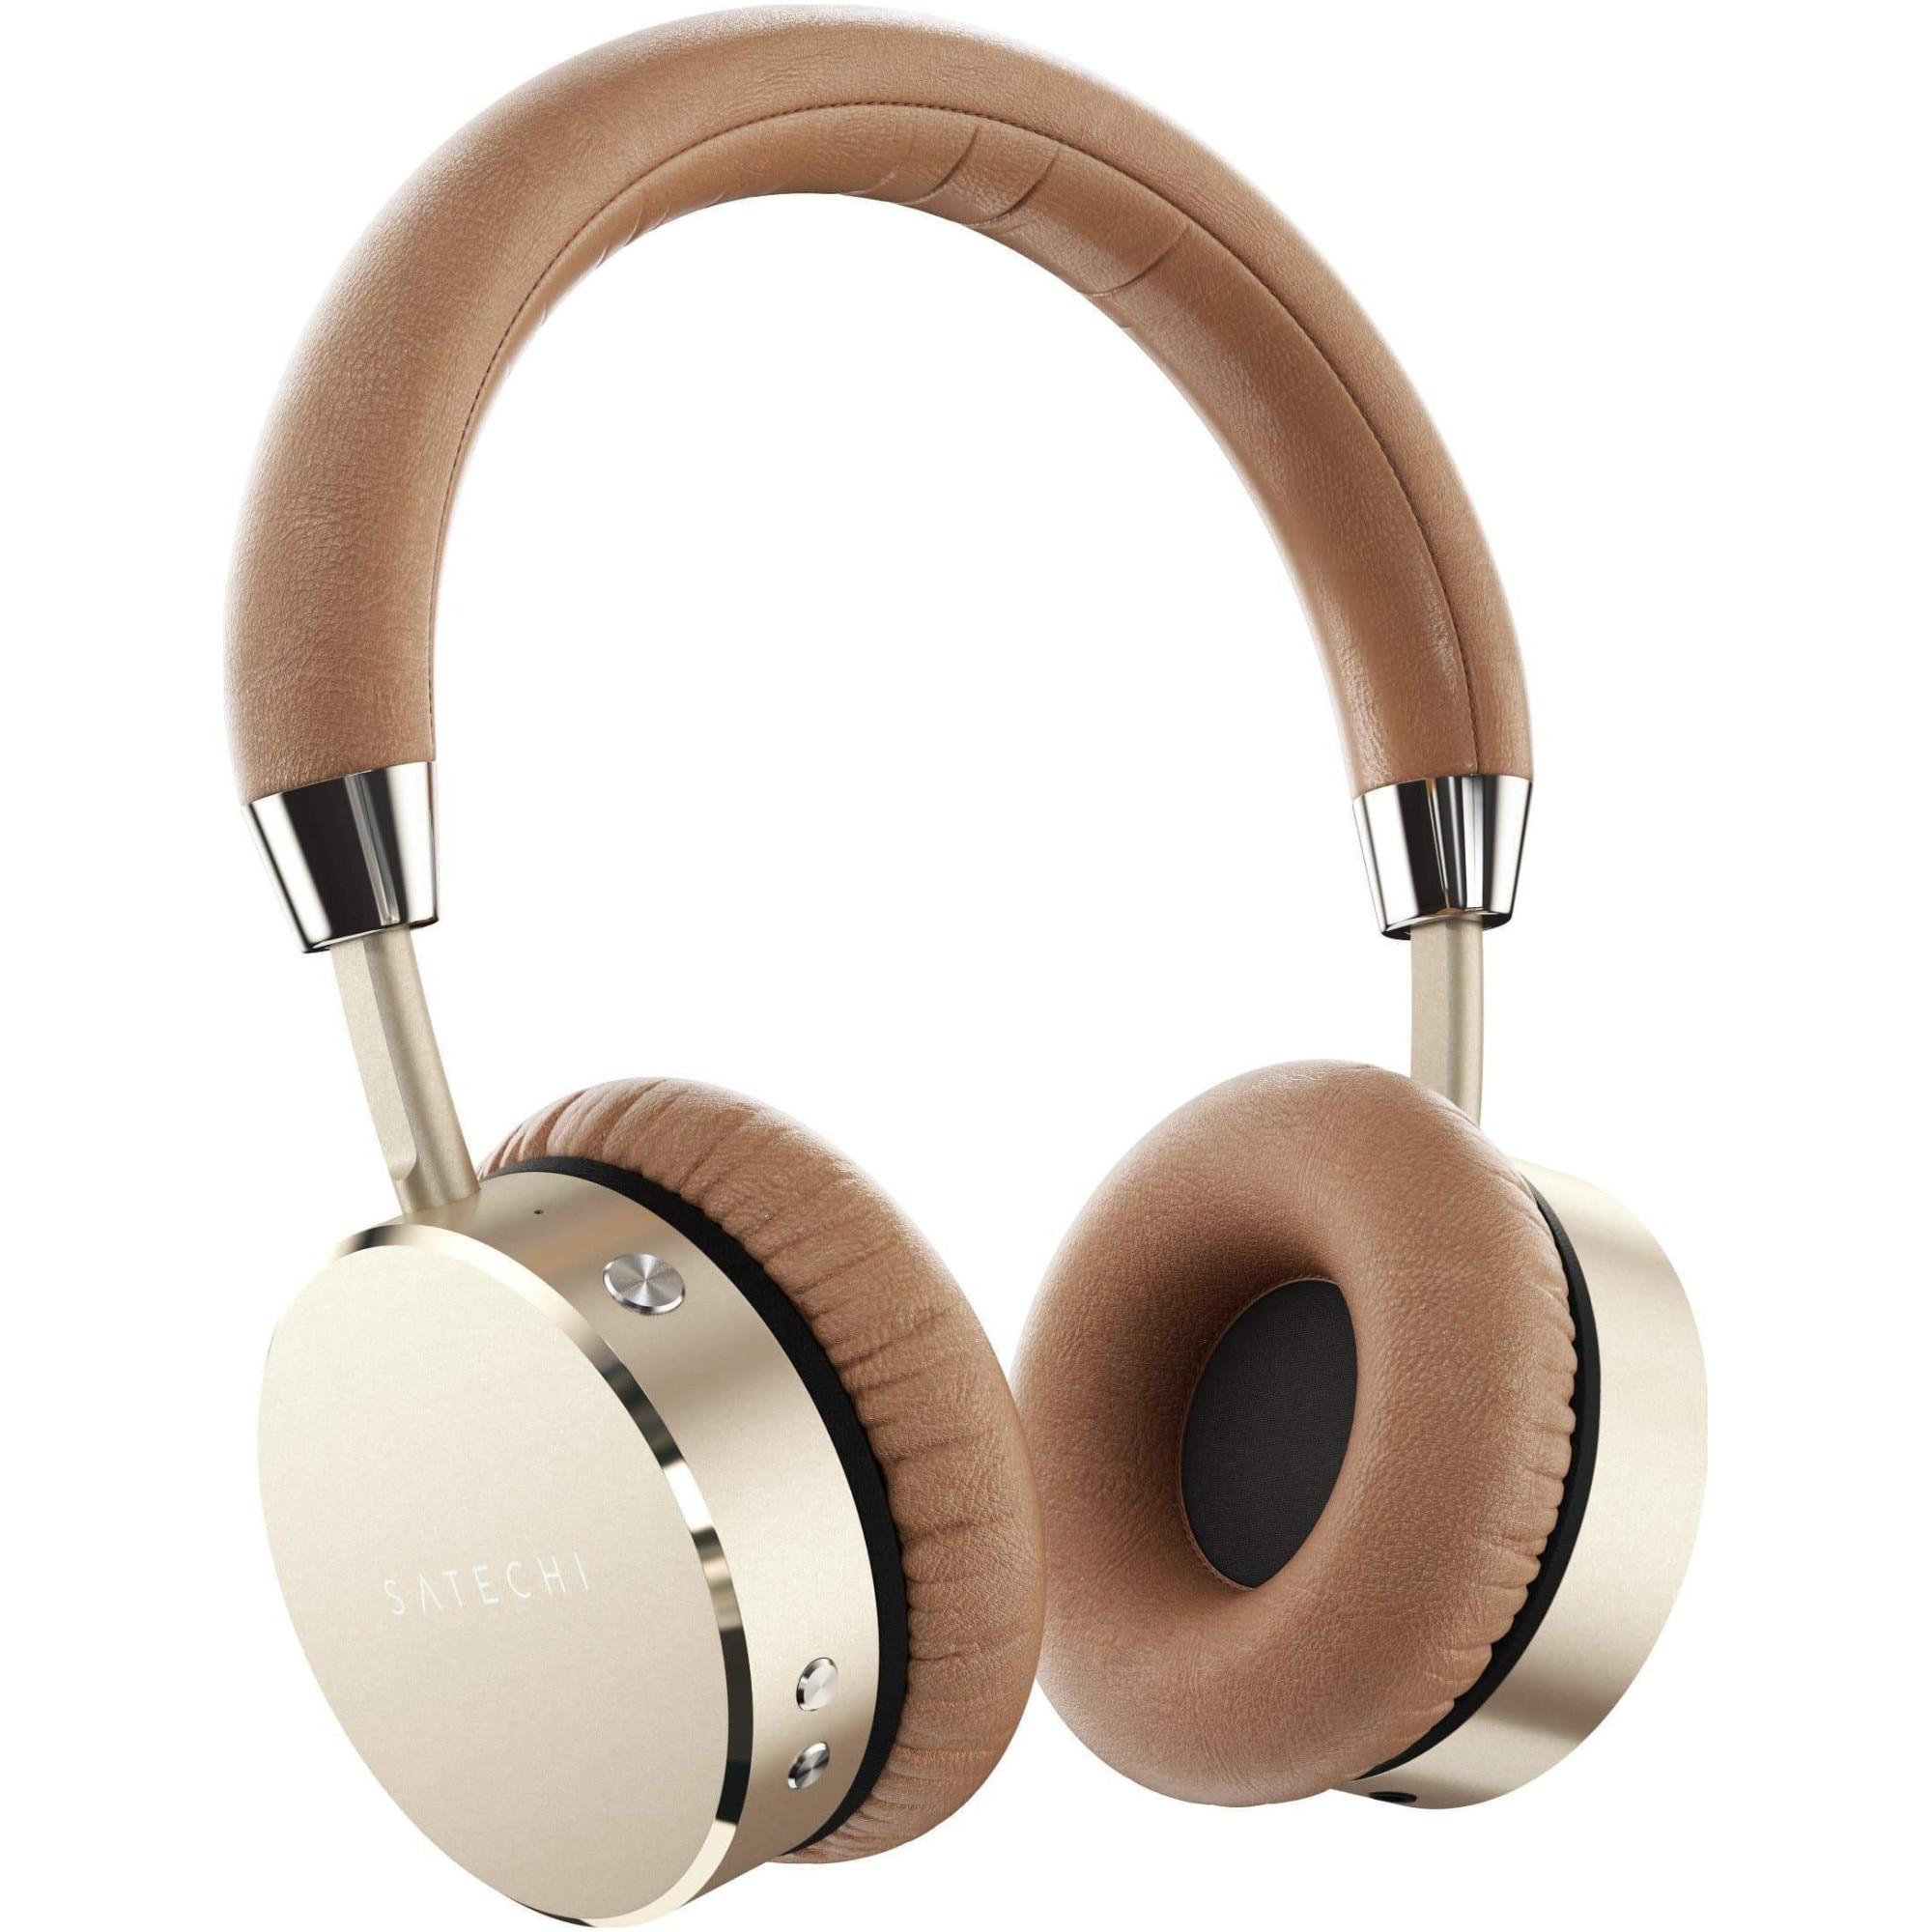 Fotografie Casti audio wireless, Satechi, aluminiu, Gold